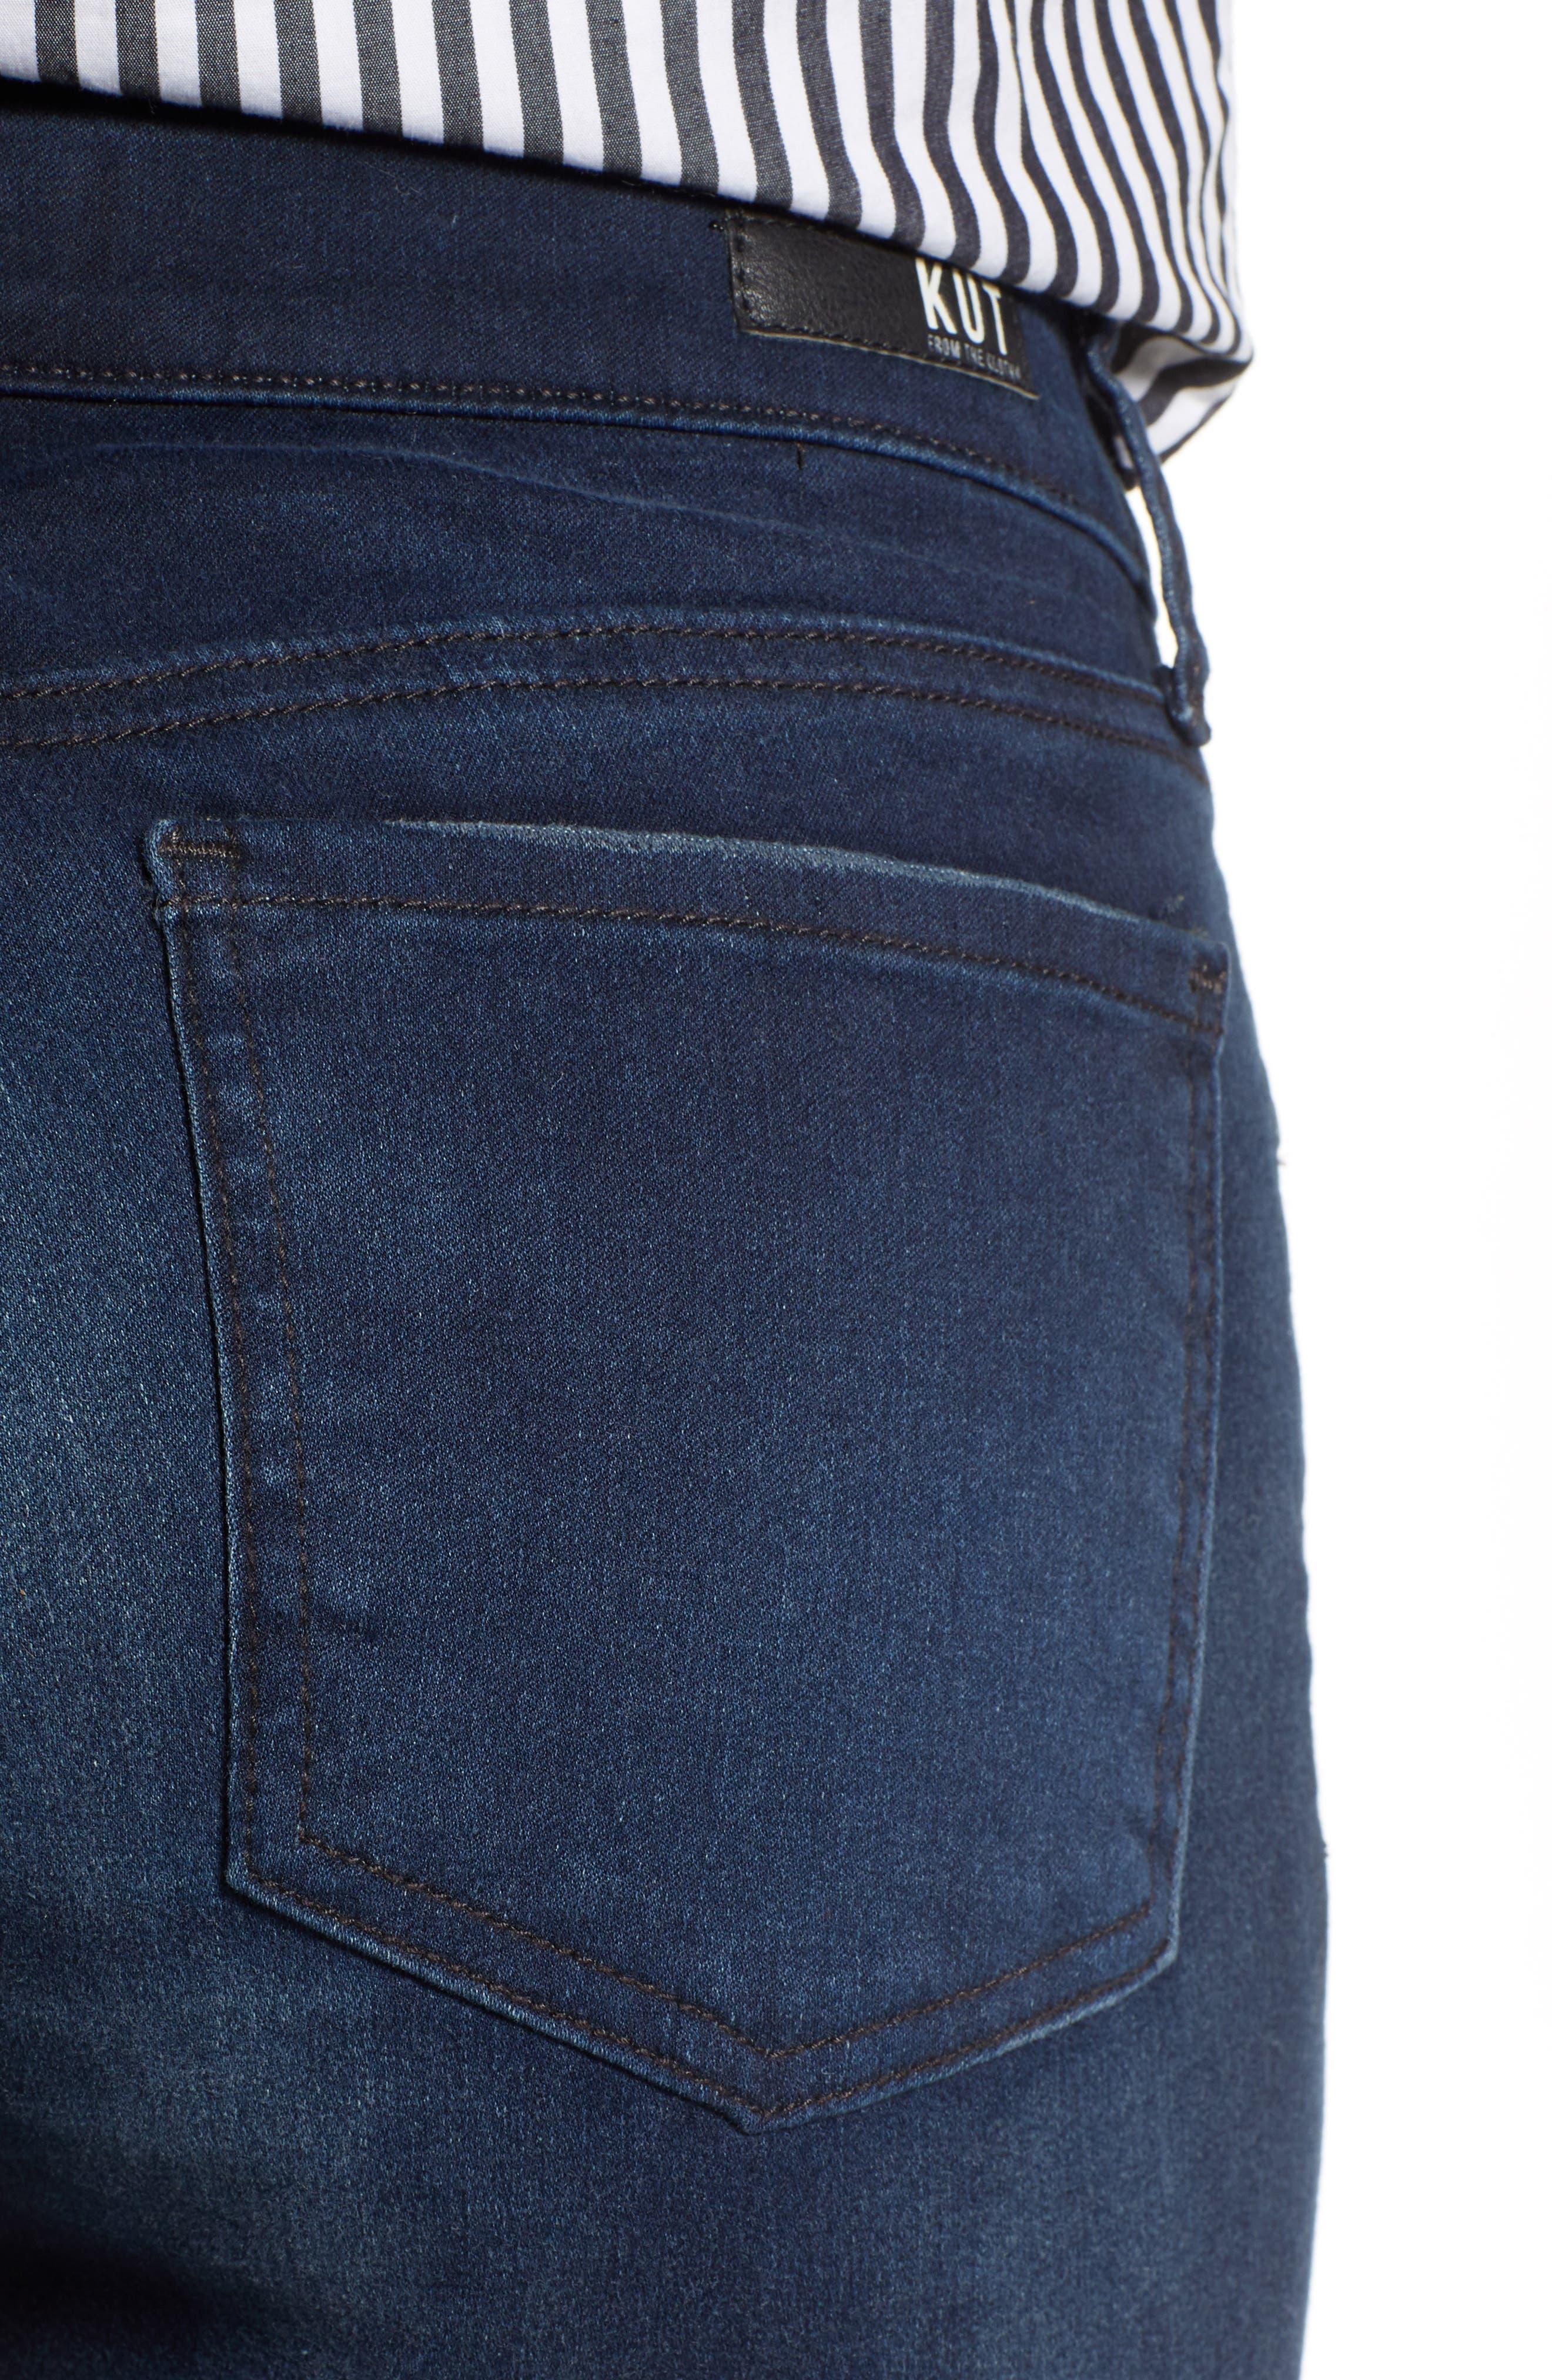 Diana Skinny Jeans,                             Alternate thumbnail 4, color,                             ART W/ EURO BASE WASH